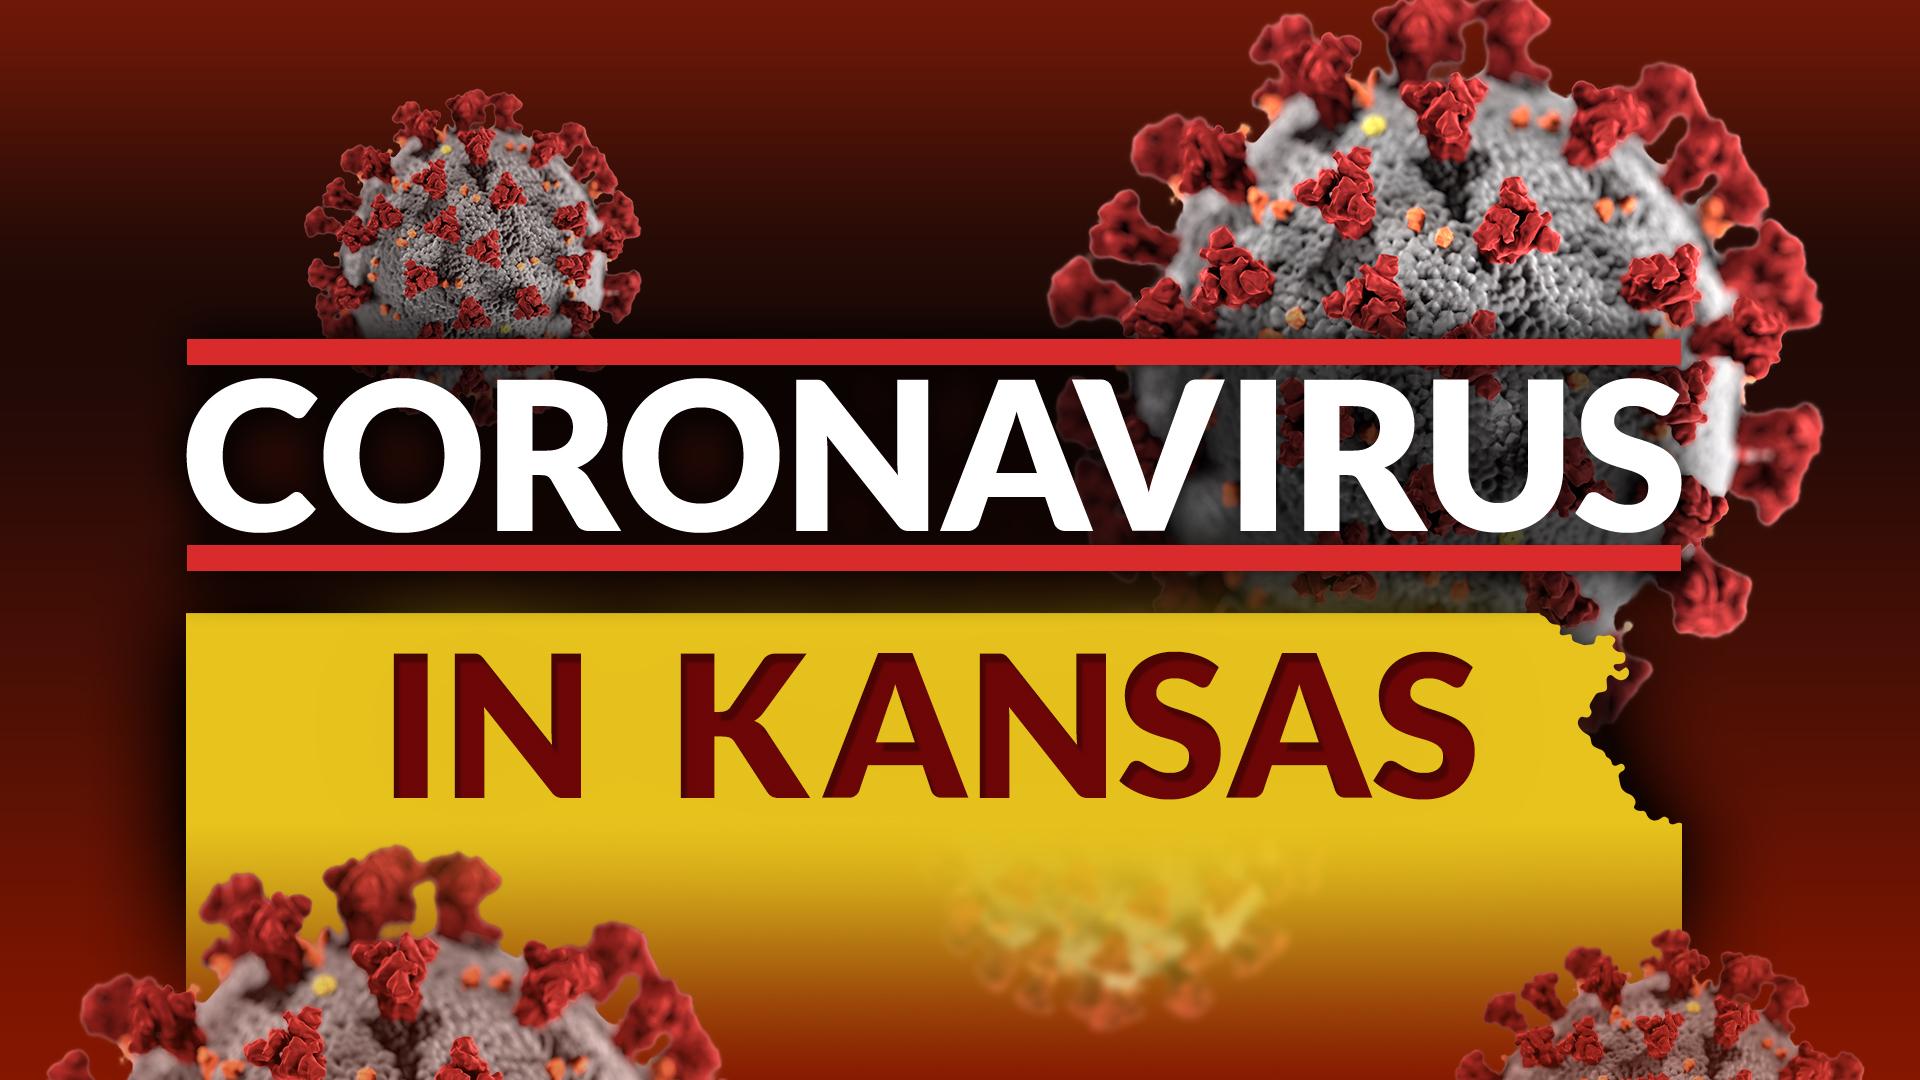 Coronavirus in Kansas